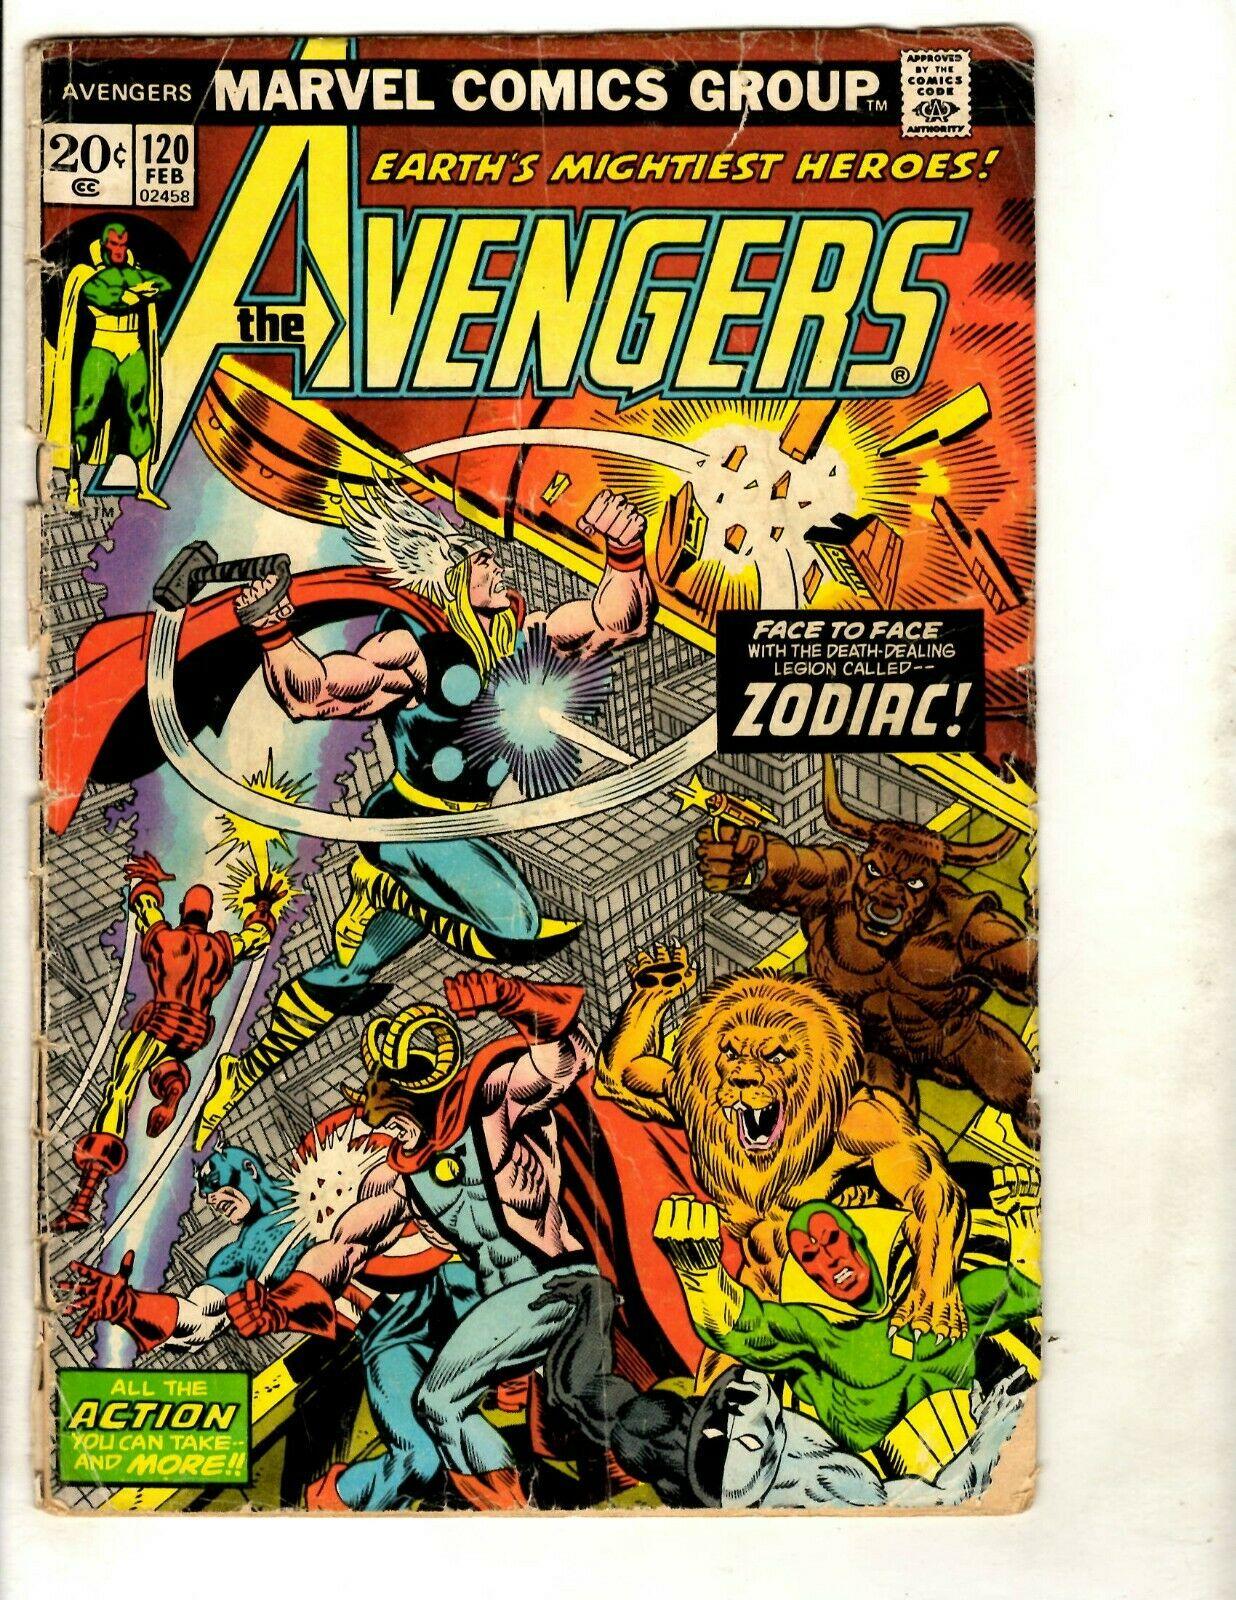 Marvel Comics Issue 266! Avengers